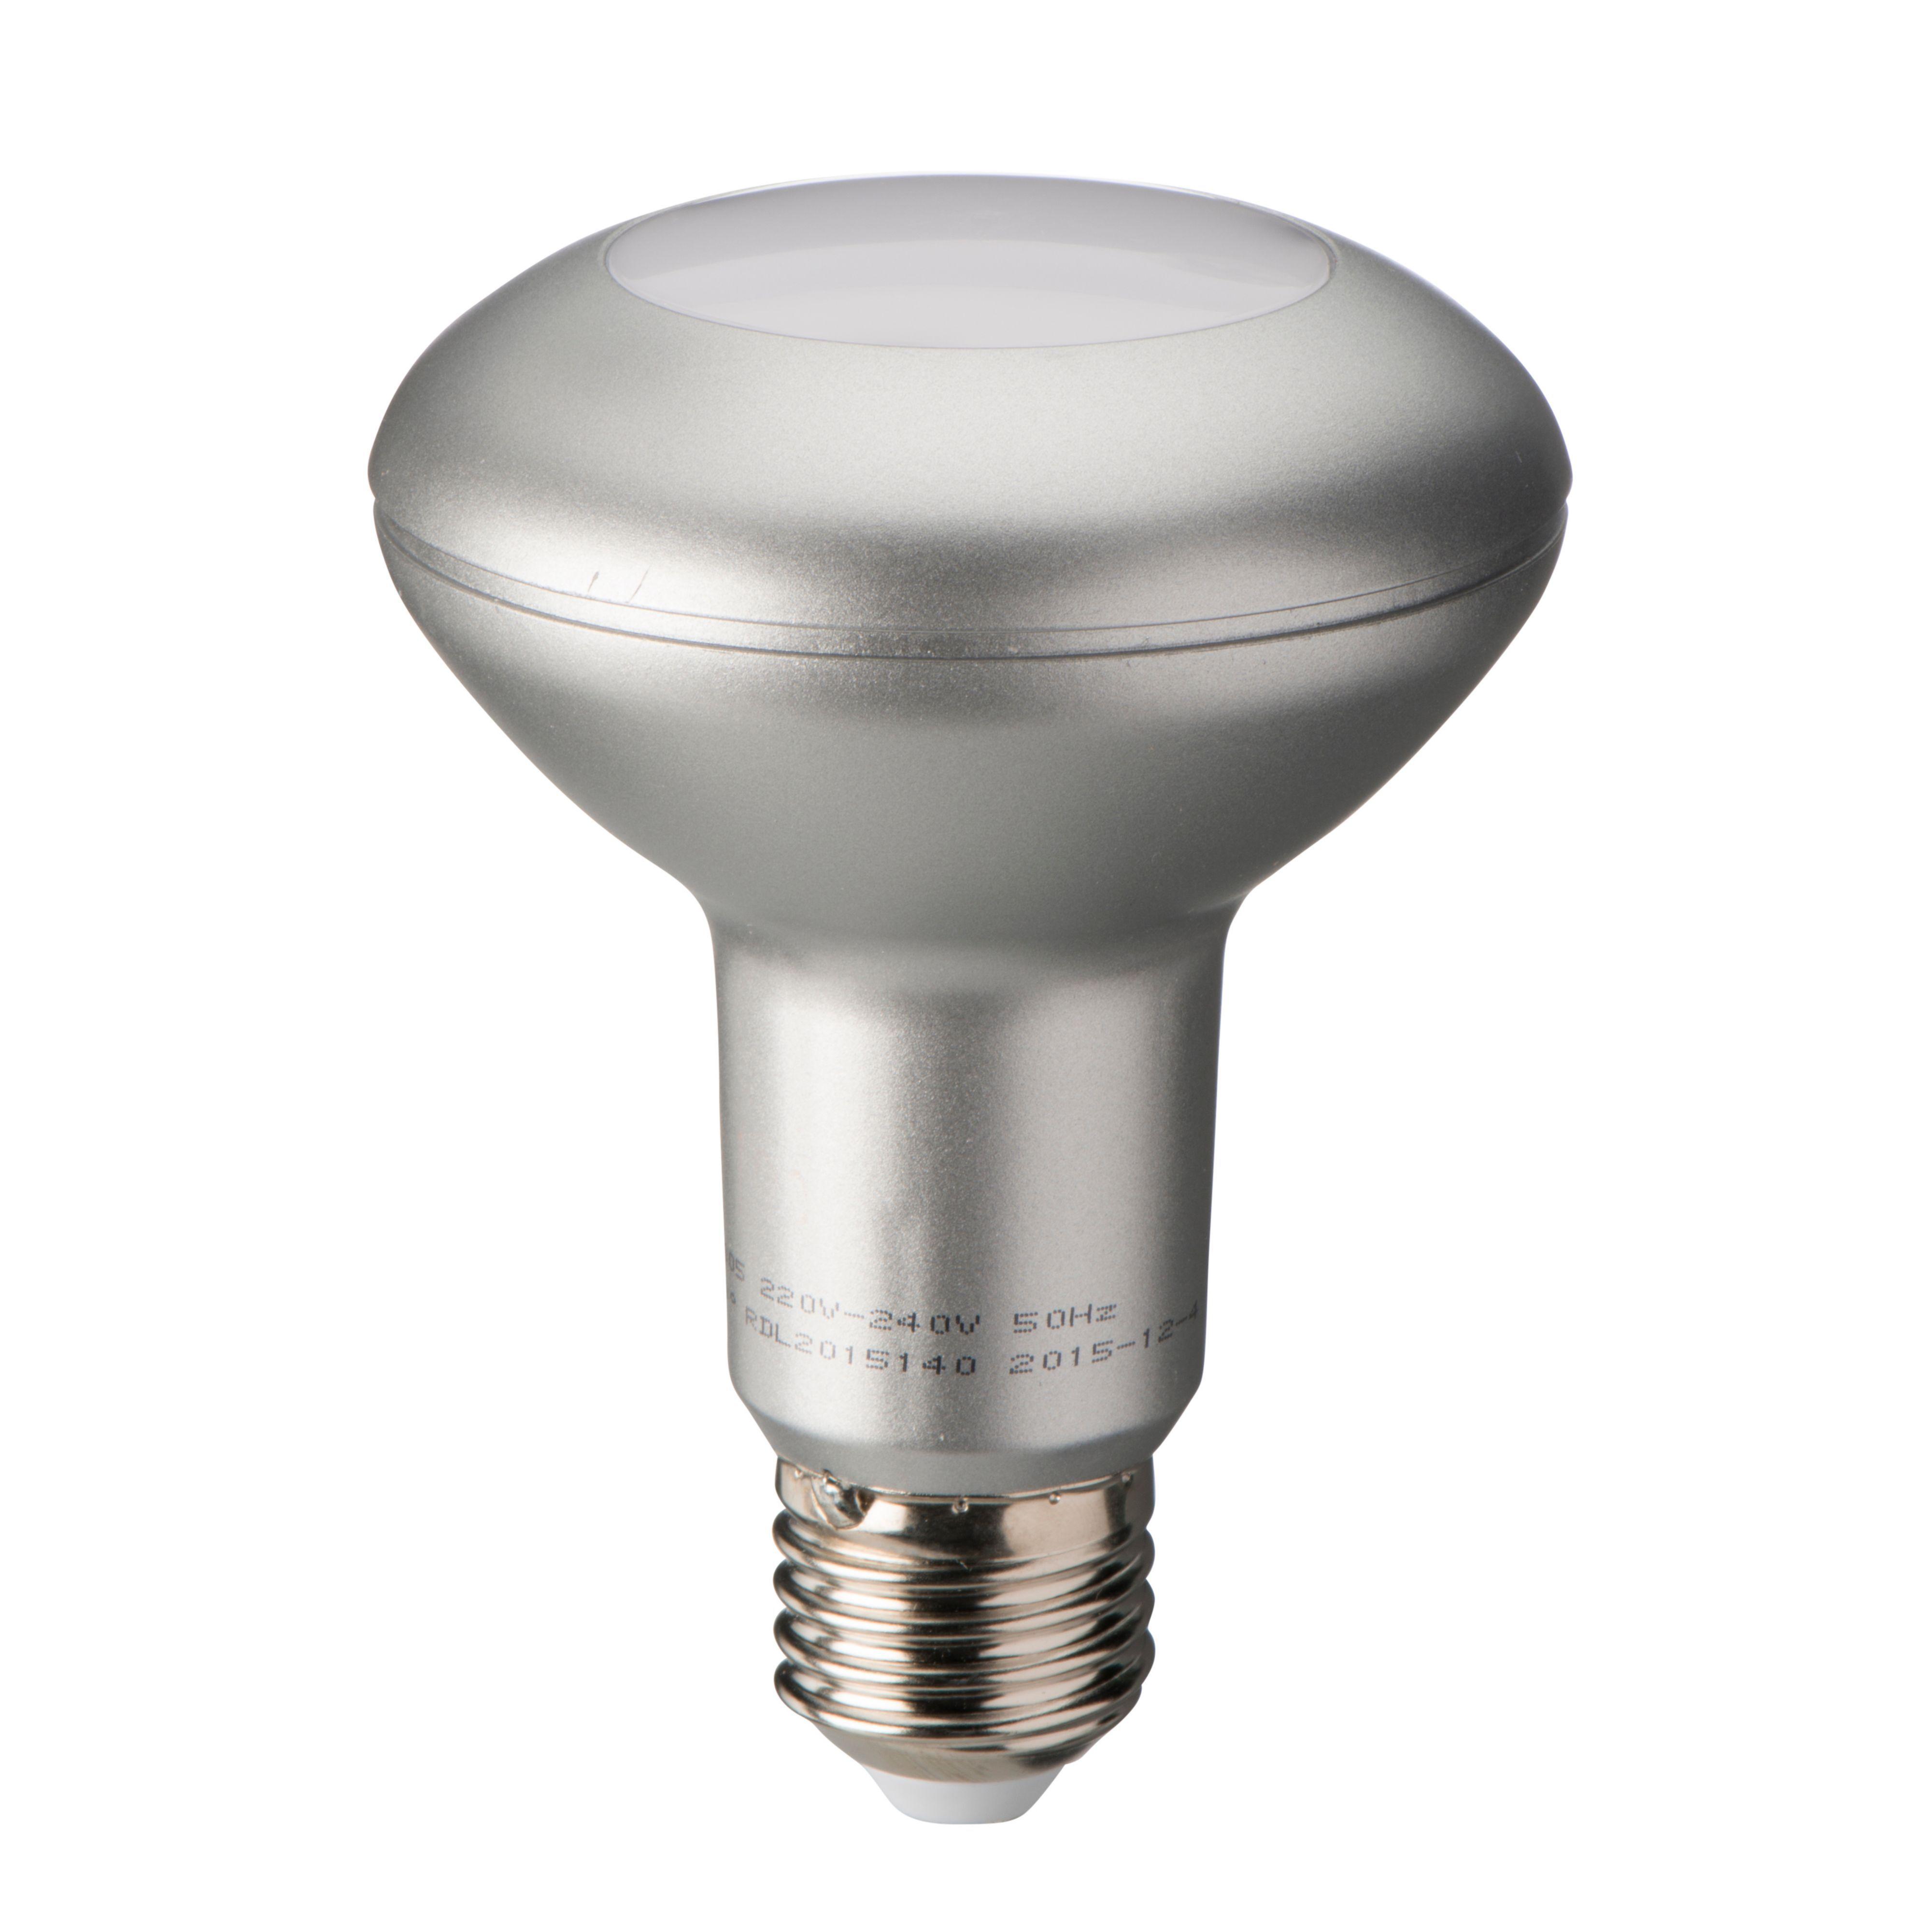 Diall E27 390lm LED R80 Light Bulb